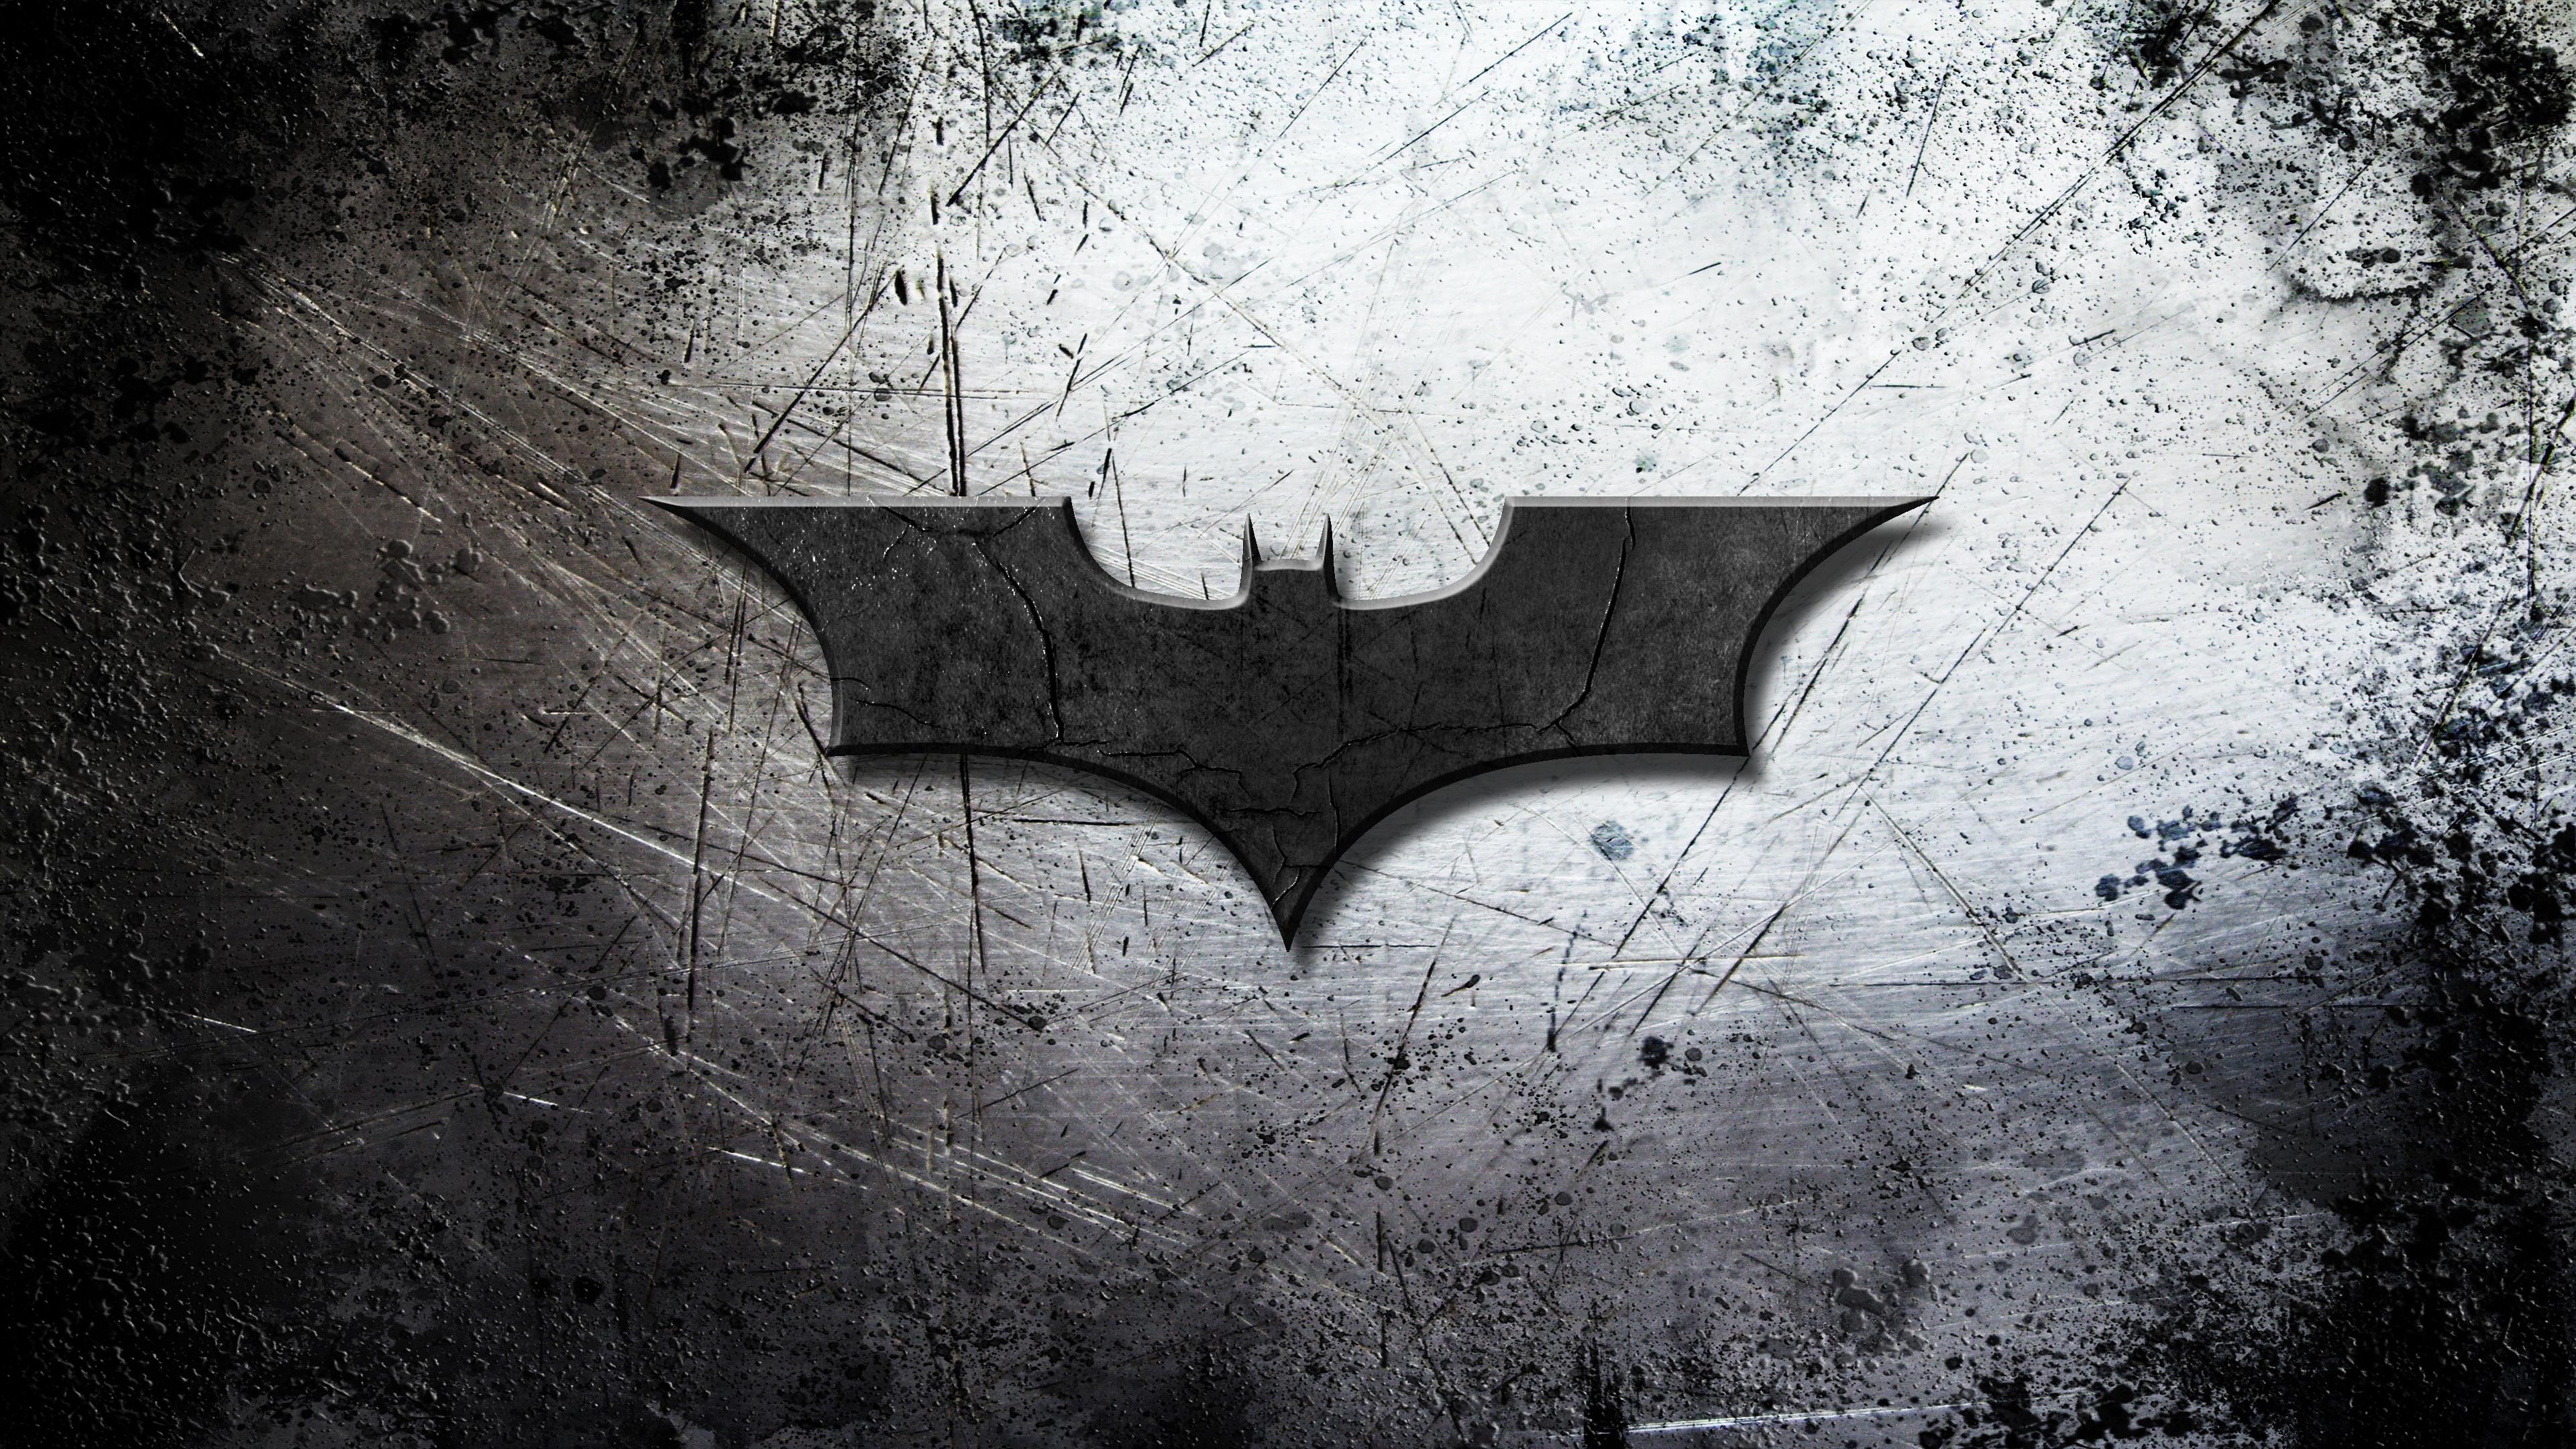 4k Batman Background Texture 1822 For Desktop Backgrounds